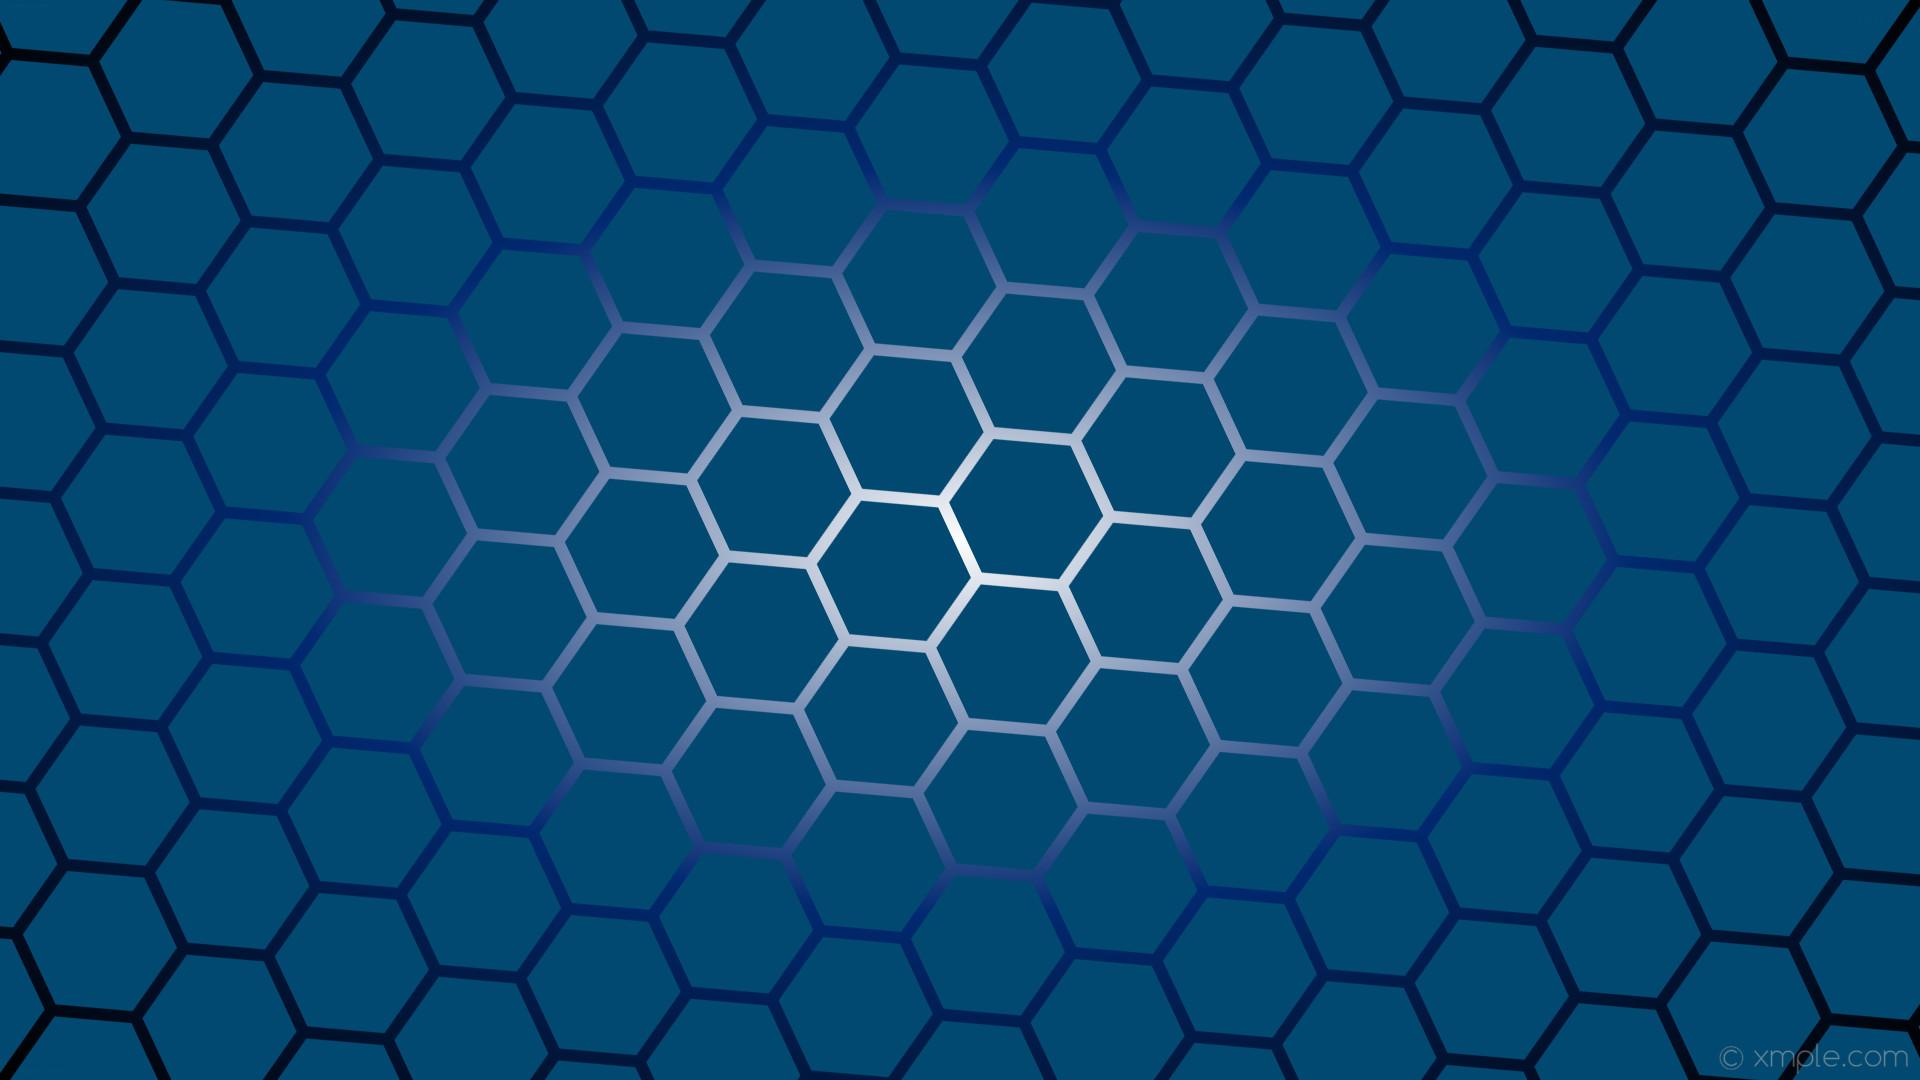 wallpaper gradient azure black hexagon glow white #014970 #ffffff #012870  diagonal 25°